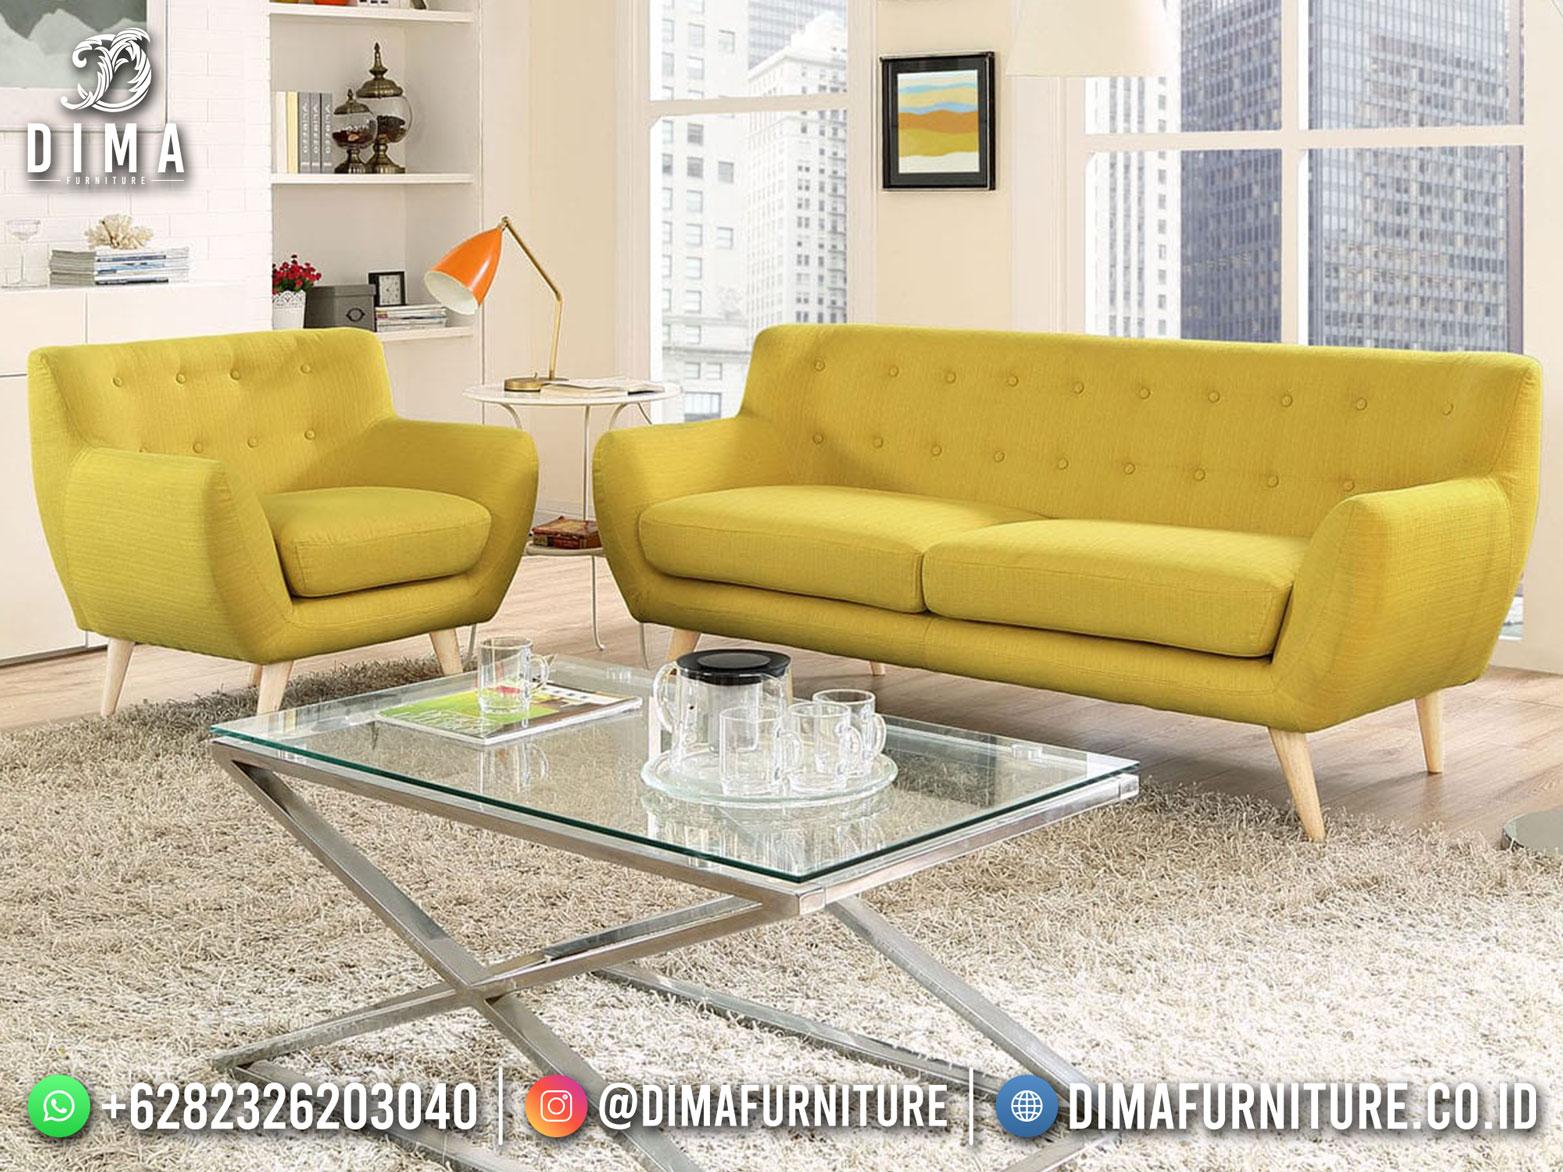 New Style Sofa Tamu Minimalis Excellent Lemonade TTJ-1779